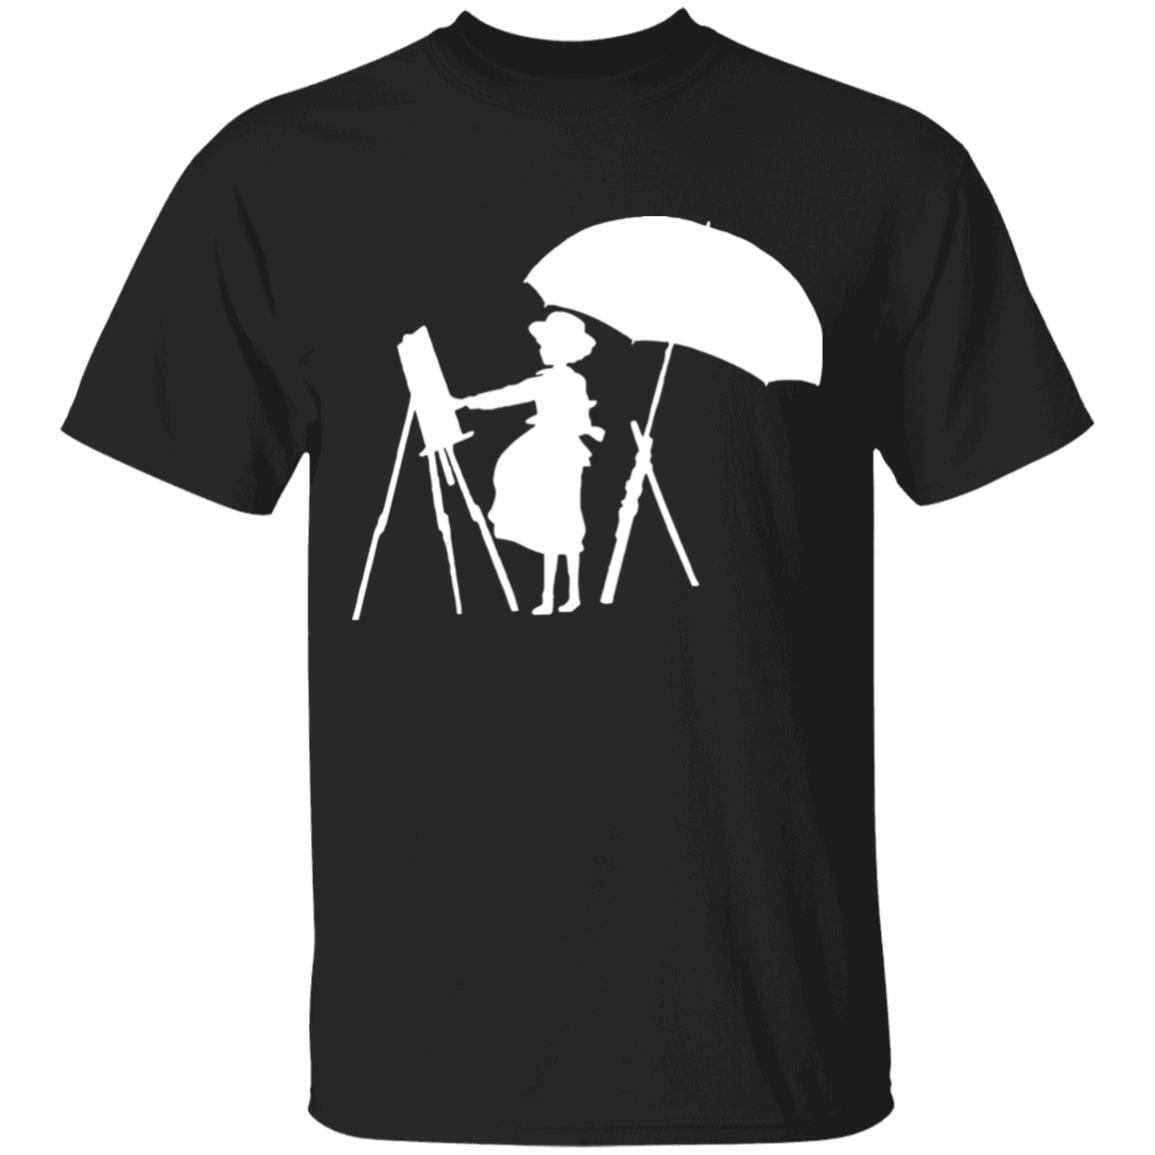 The Wind Rises Cutout Black & White T Shirt